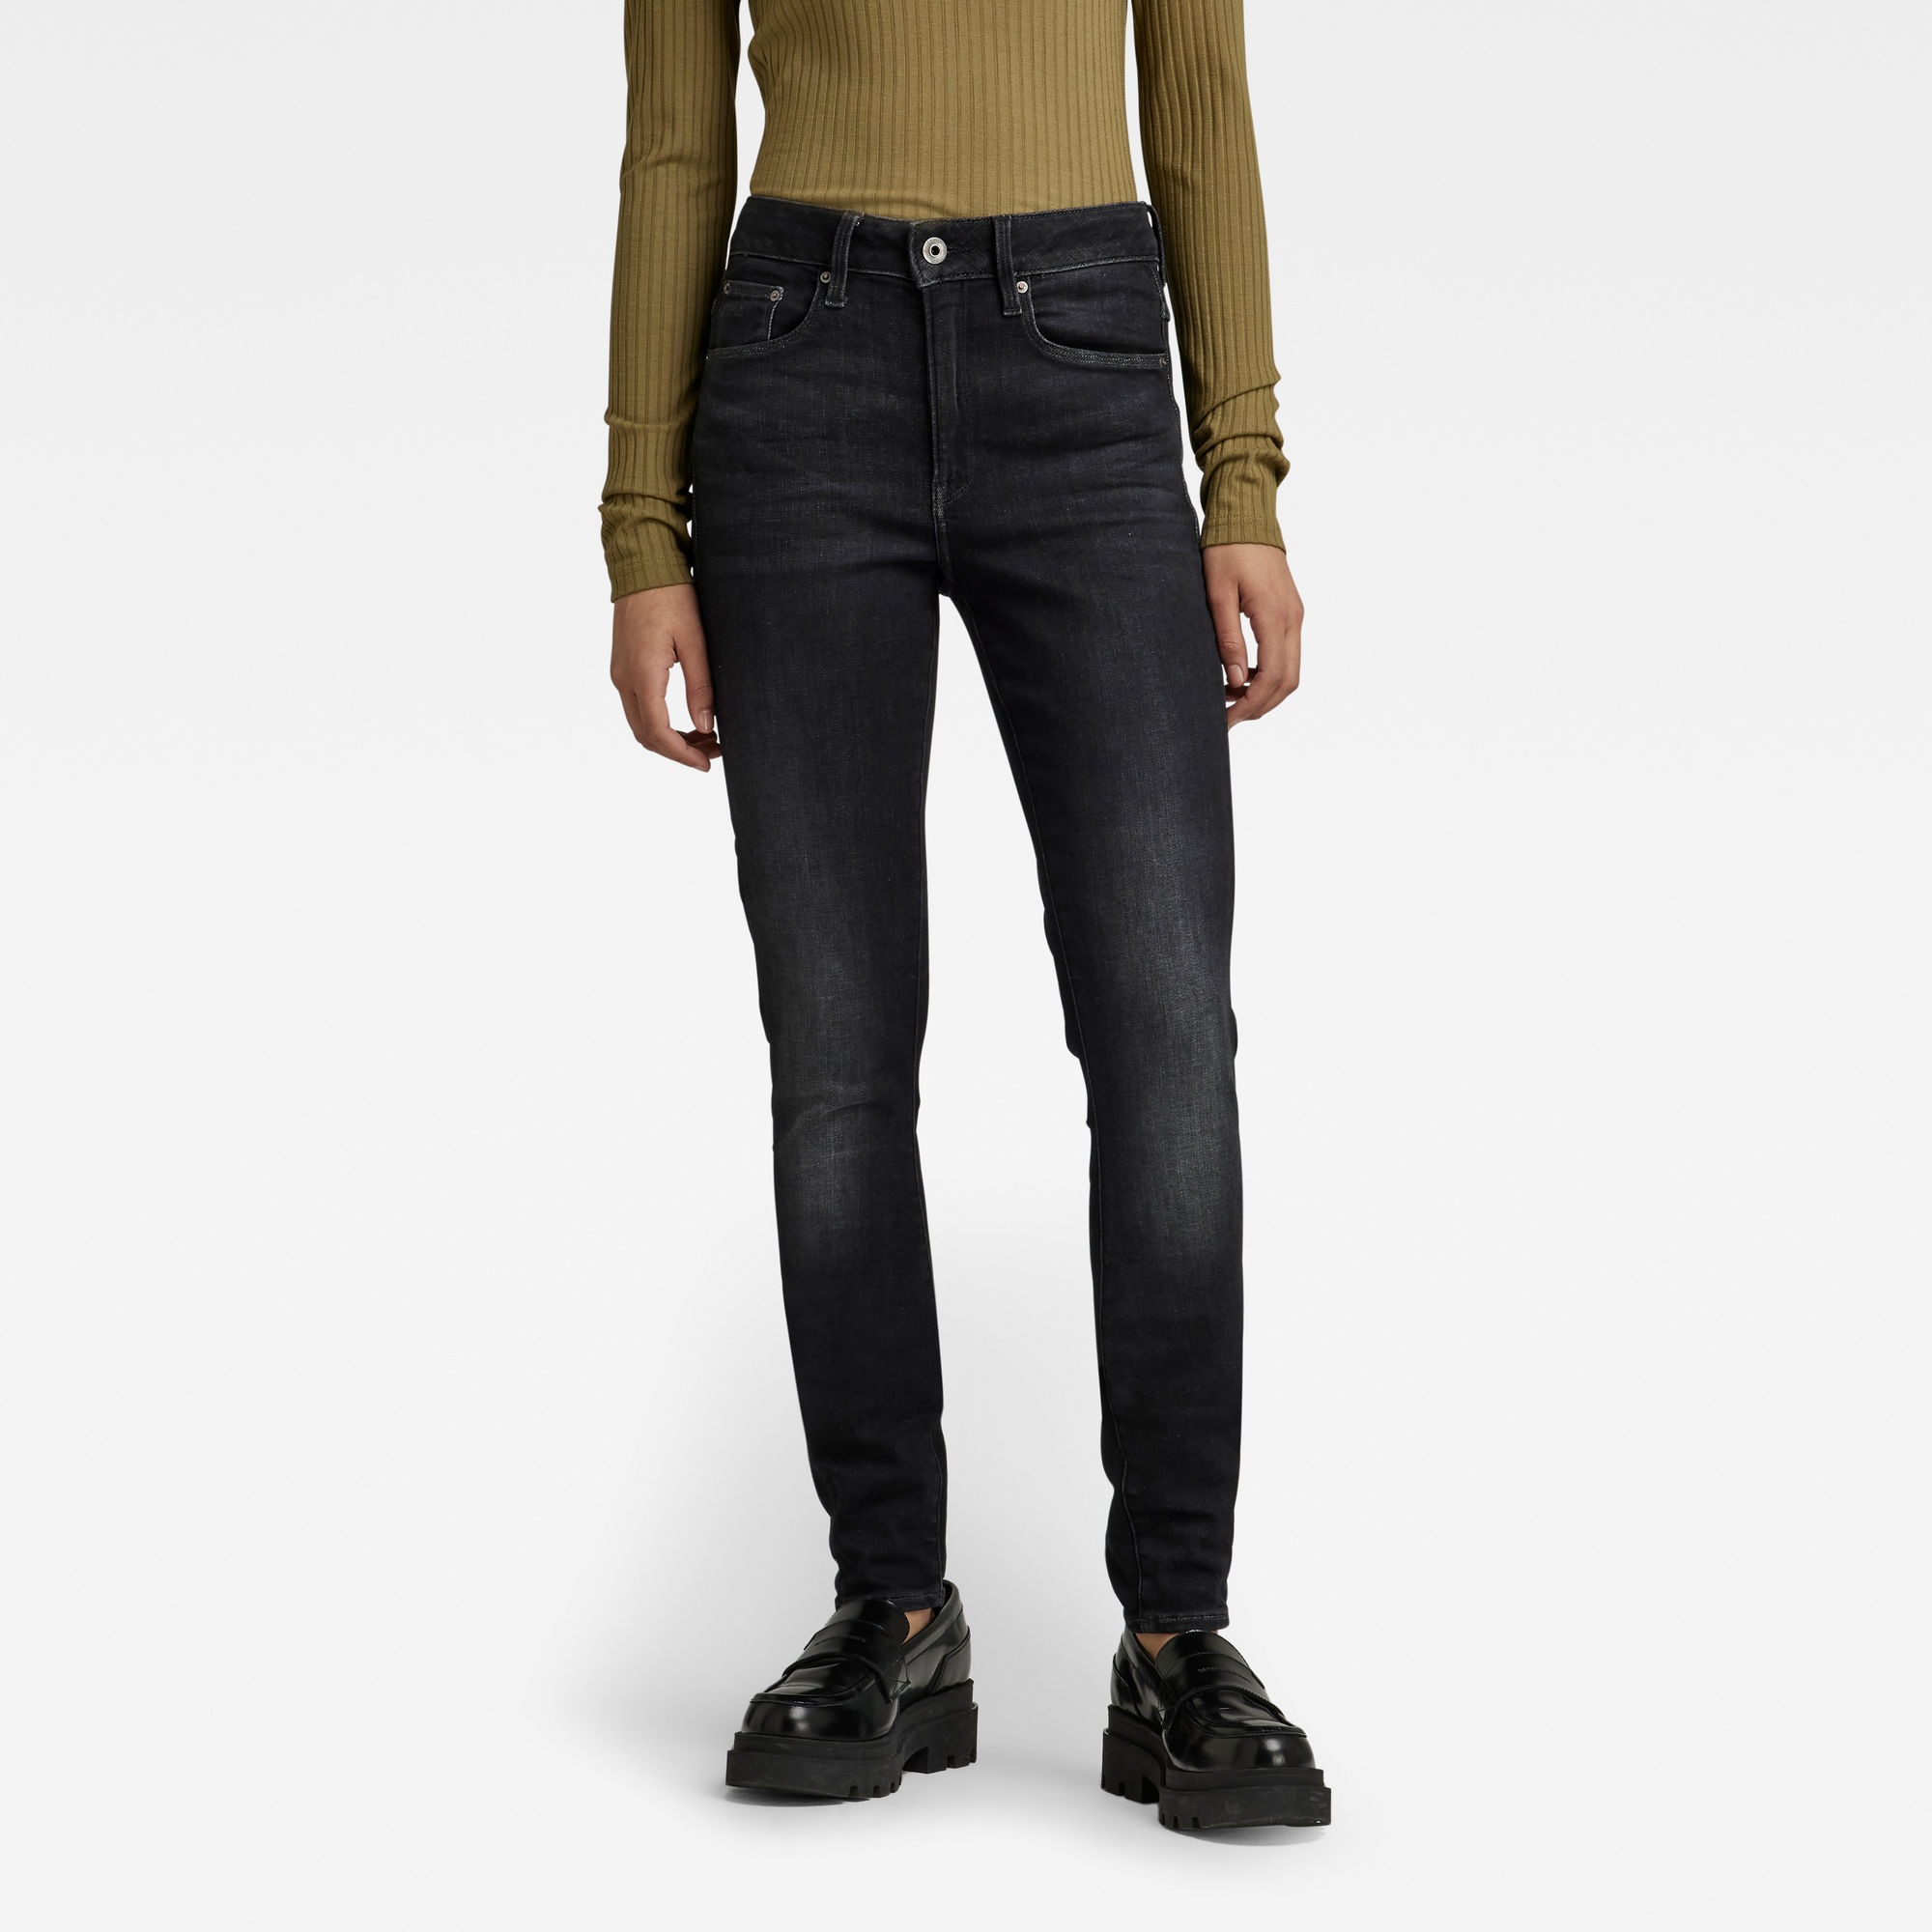 G-Star RAW Dames 3301 High Skinny Jeans Zwart